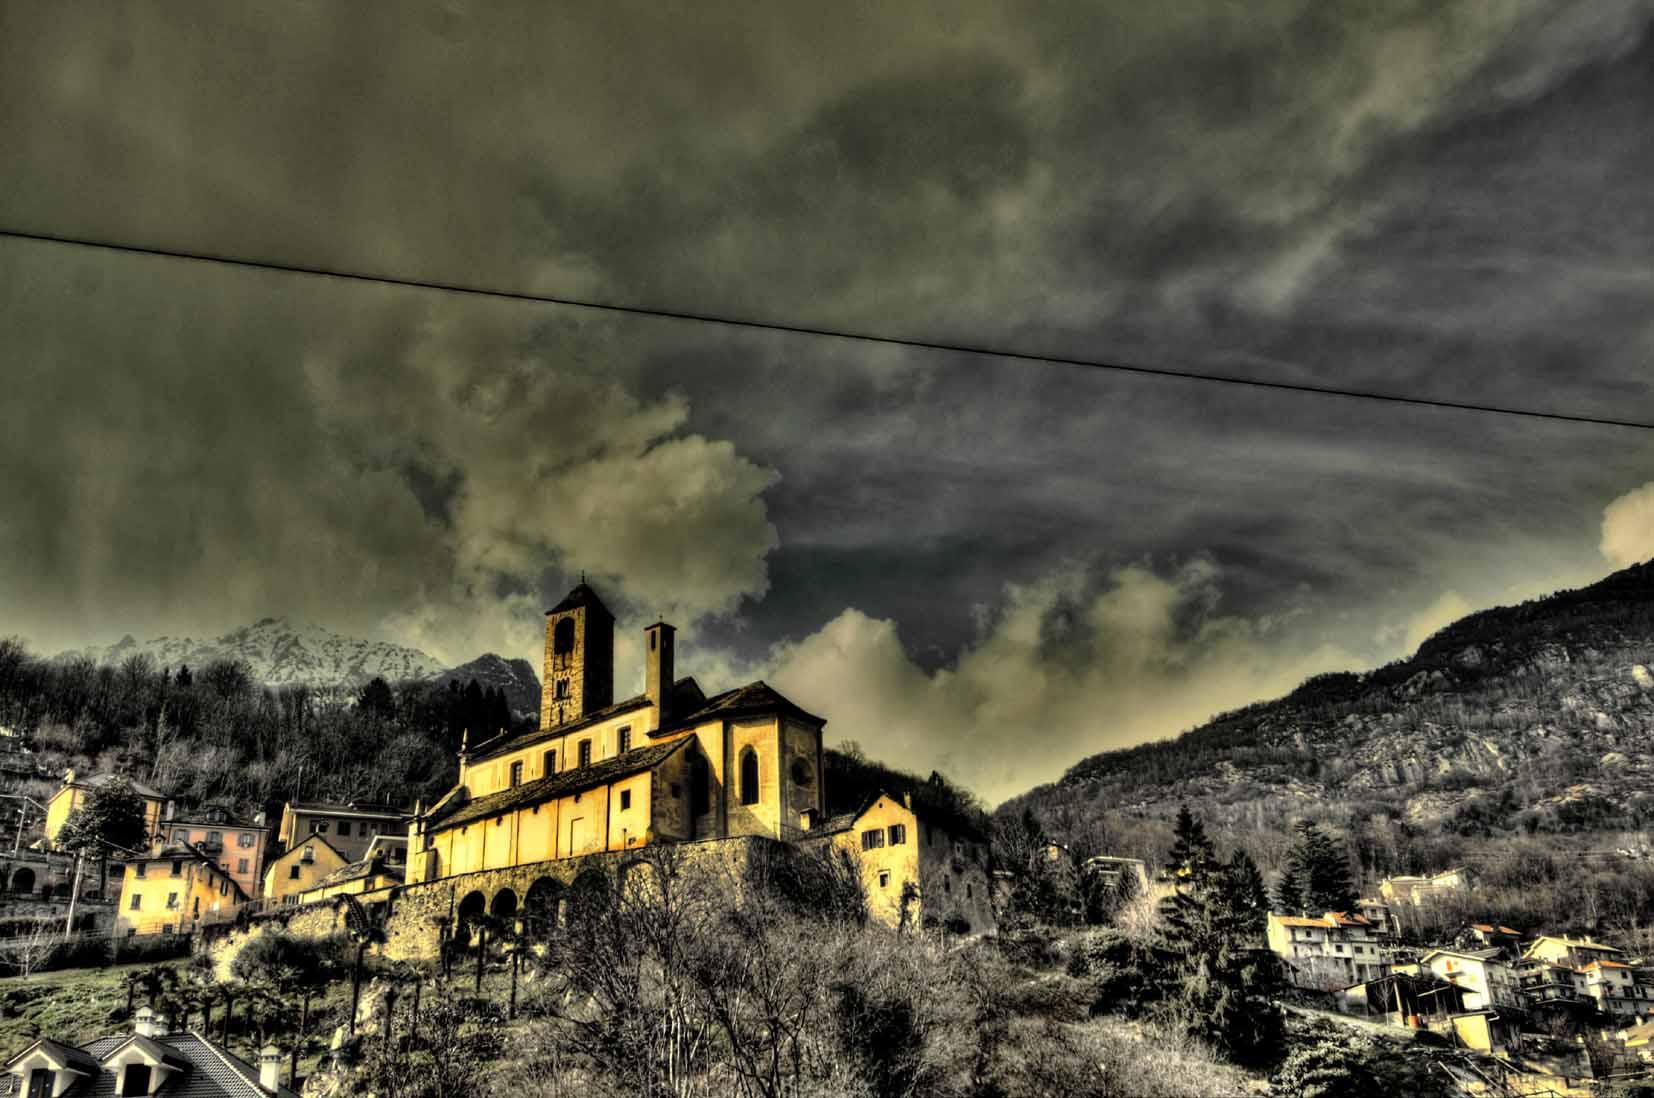 Chiesa di Crevoladossola (vb)...